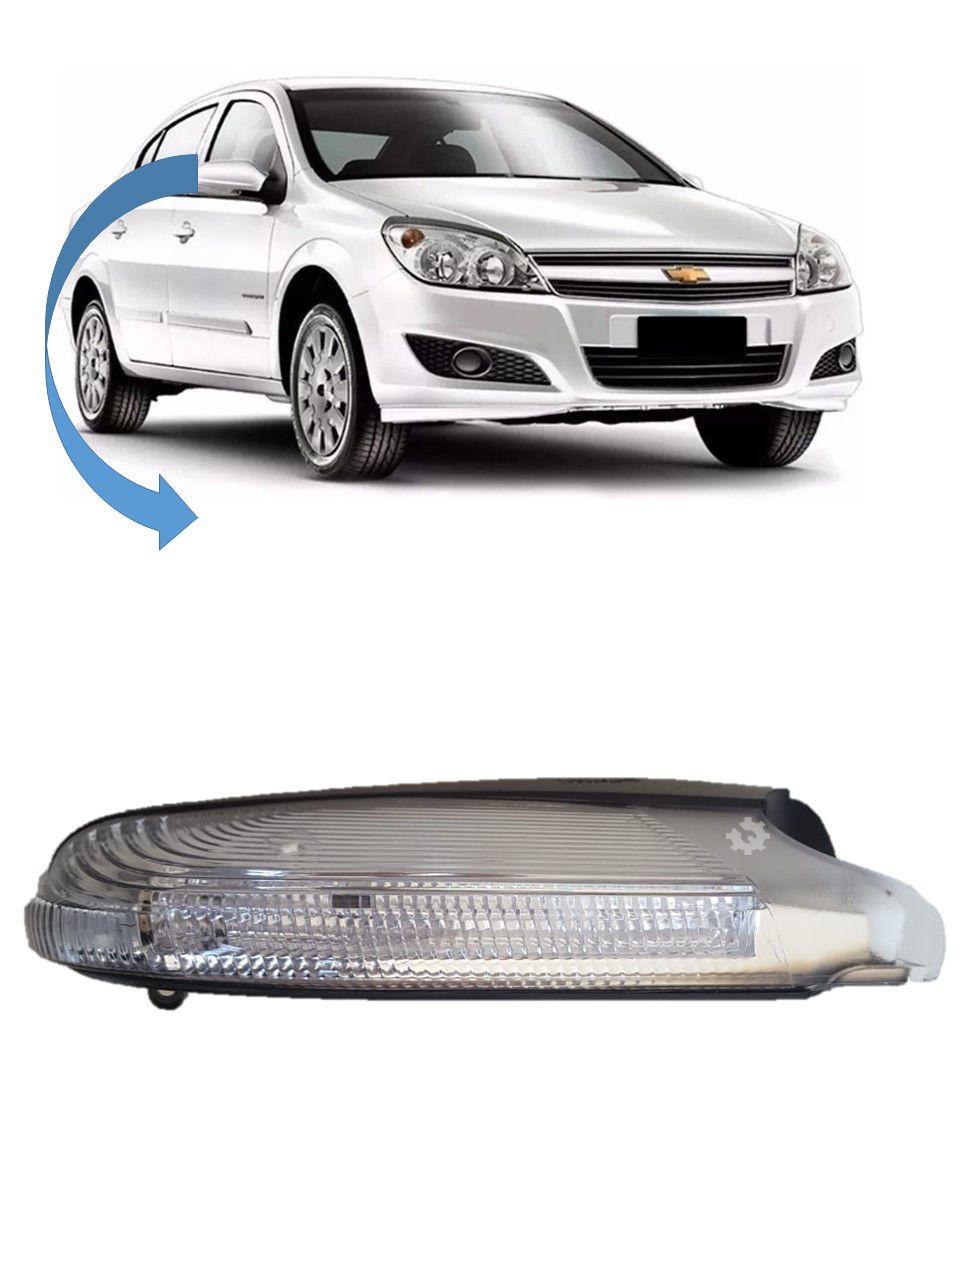 Pisca Retrovisor Direito Chevrolet Vectra 2006 2008 09 2011